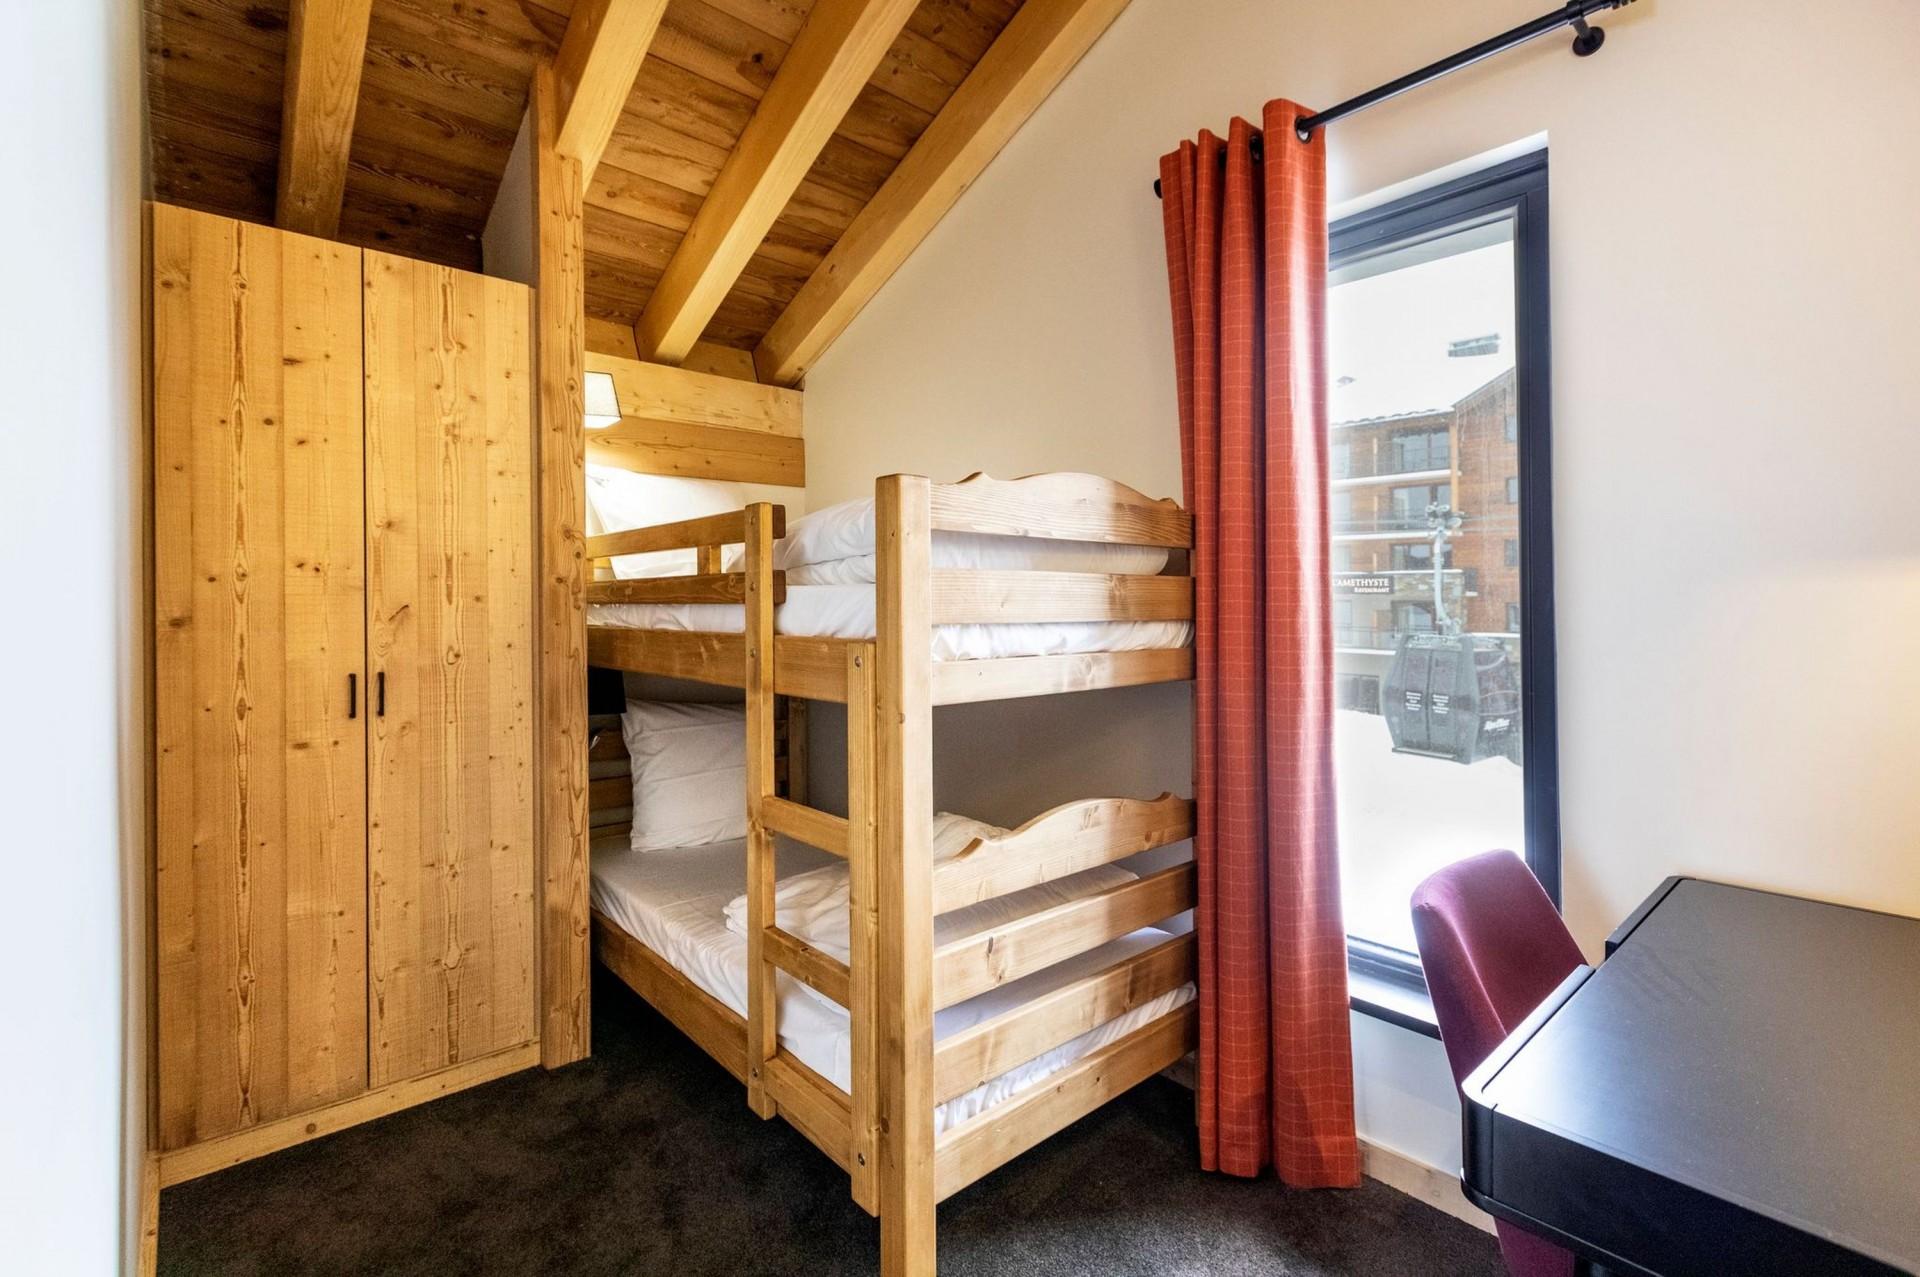 Alpe D'Huez Location Chalet Luxe Acenukite Cabine